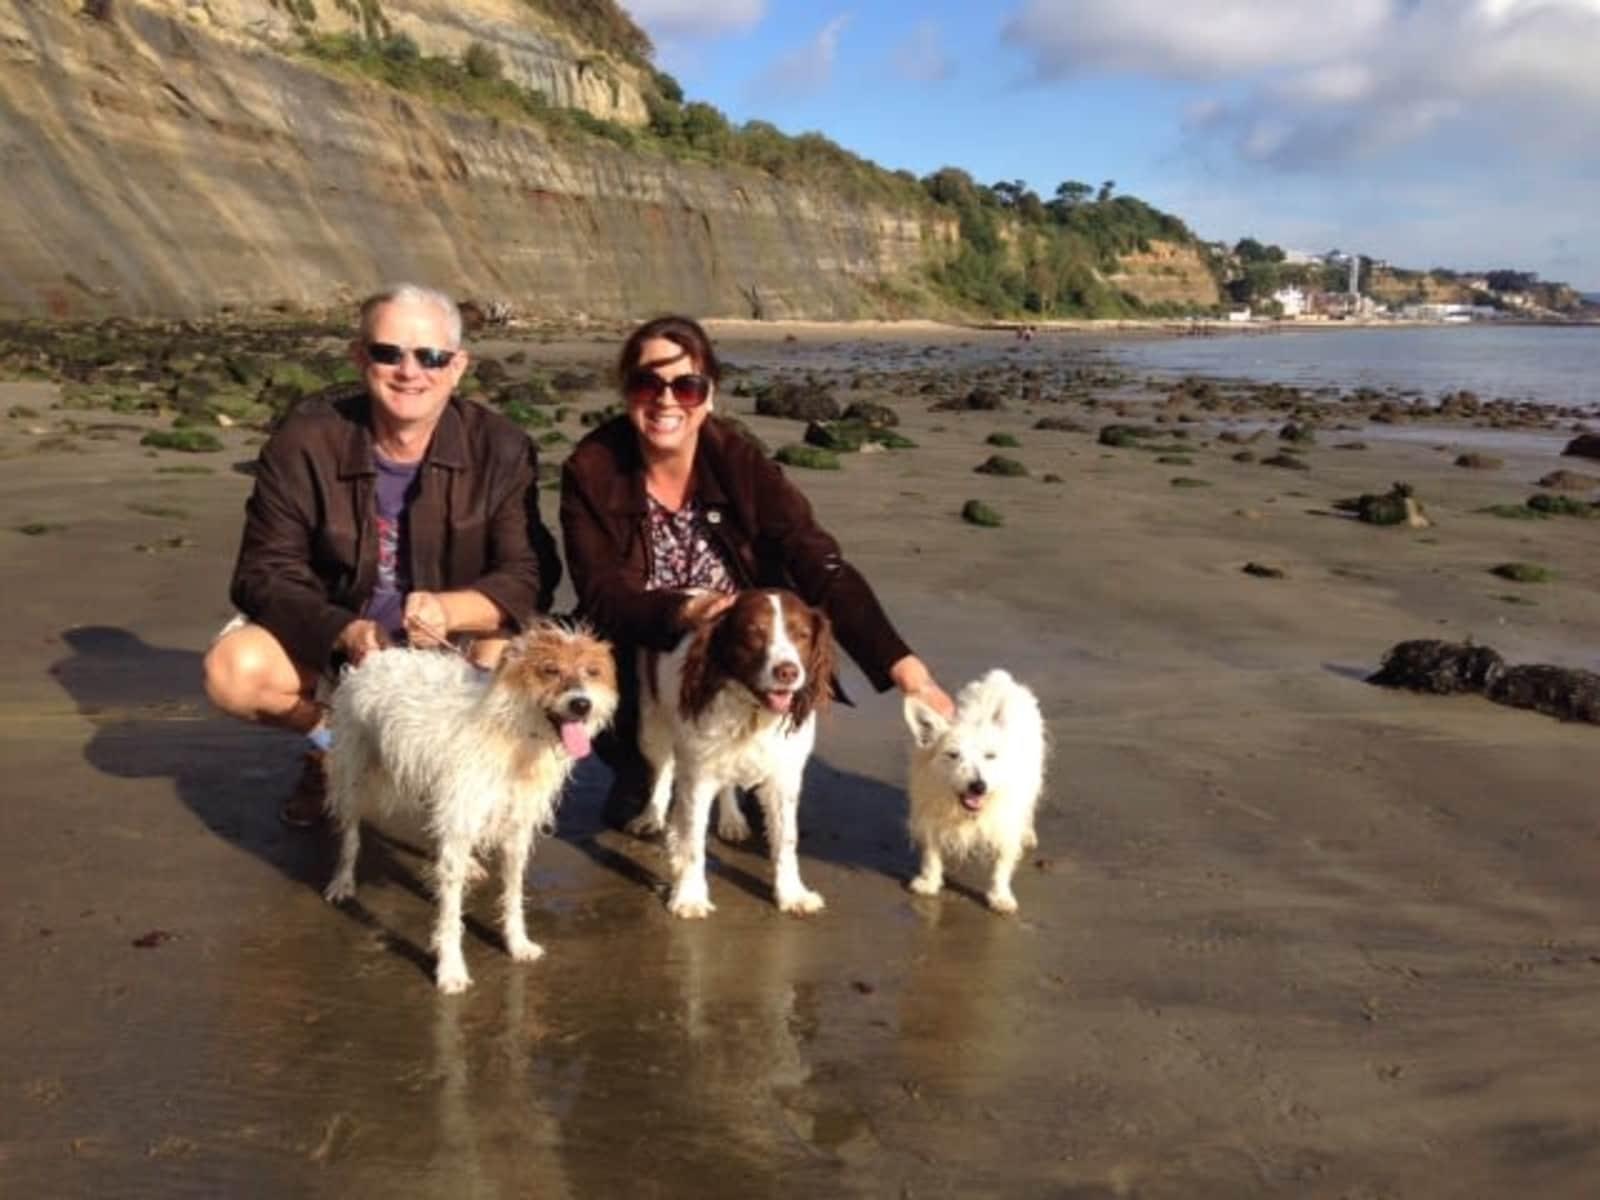 David and lisa & David from Taunton, United Kingdom